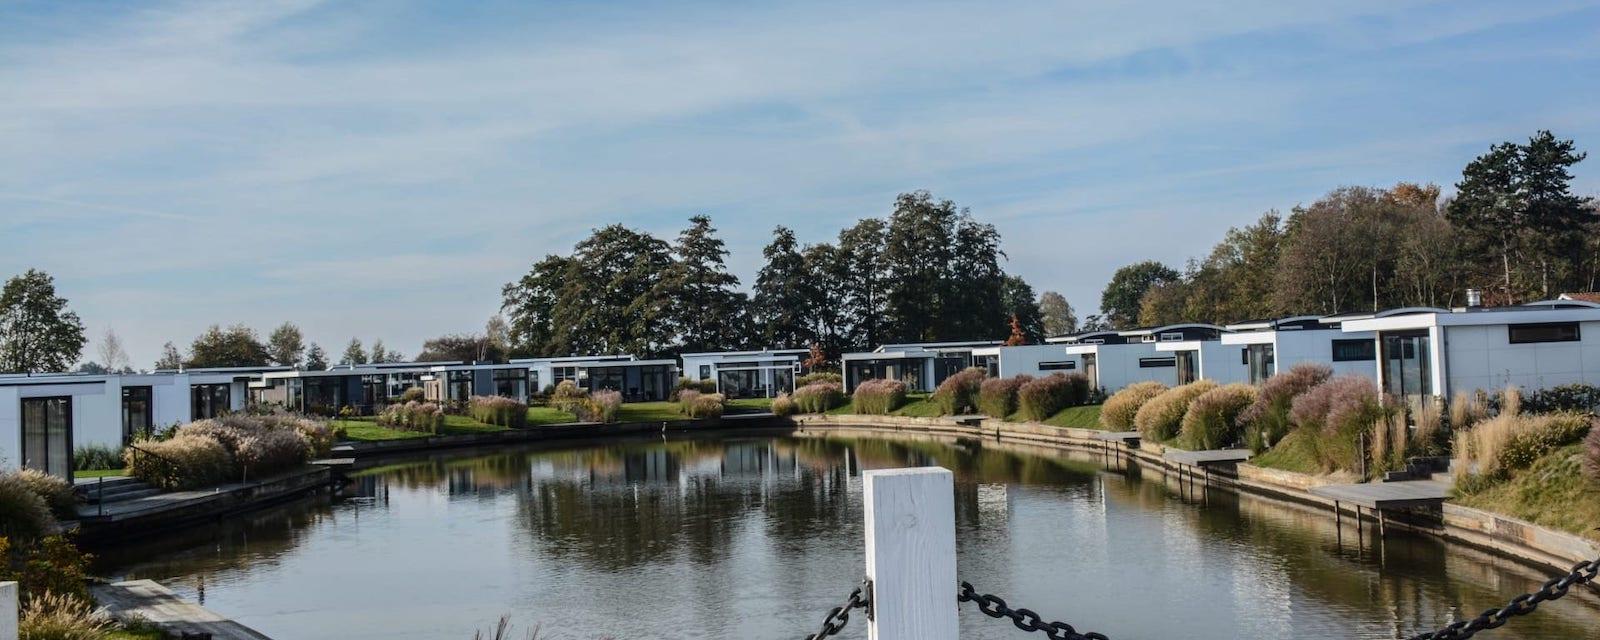 Supertrips - Resort Veluwemeer